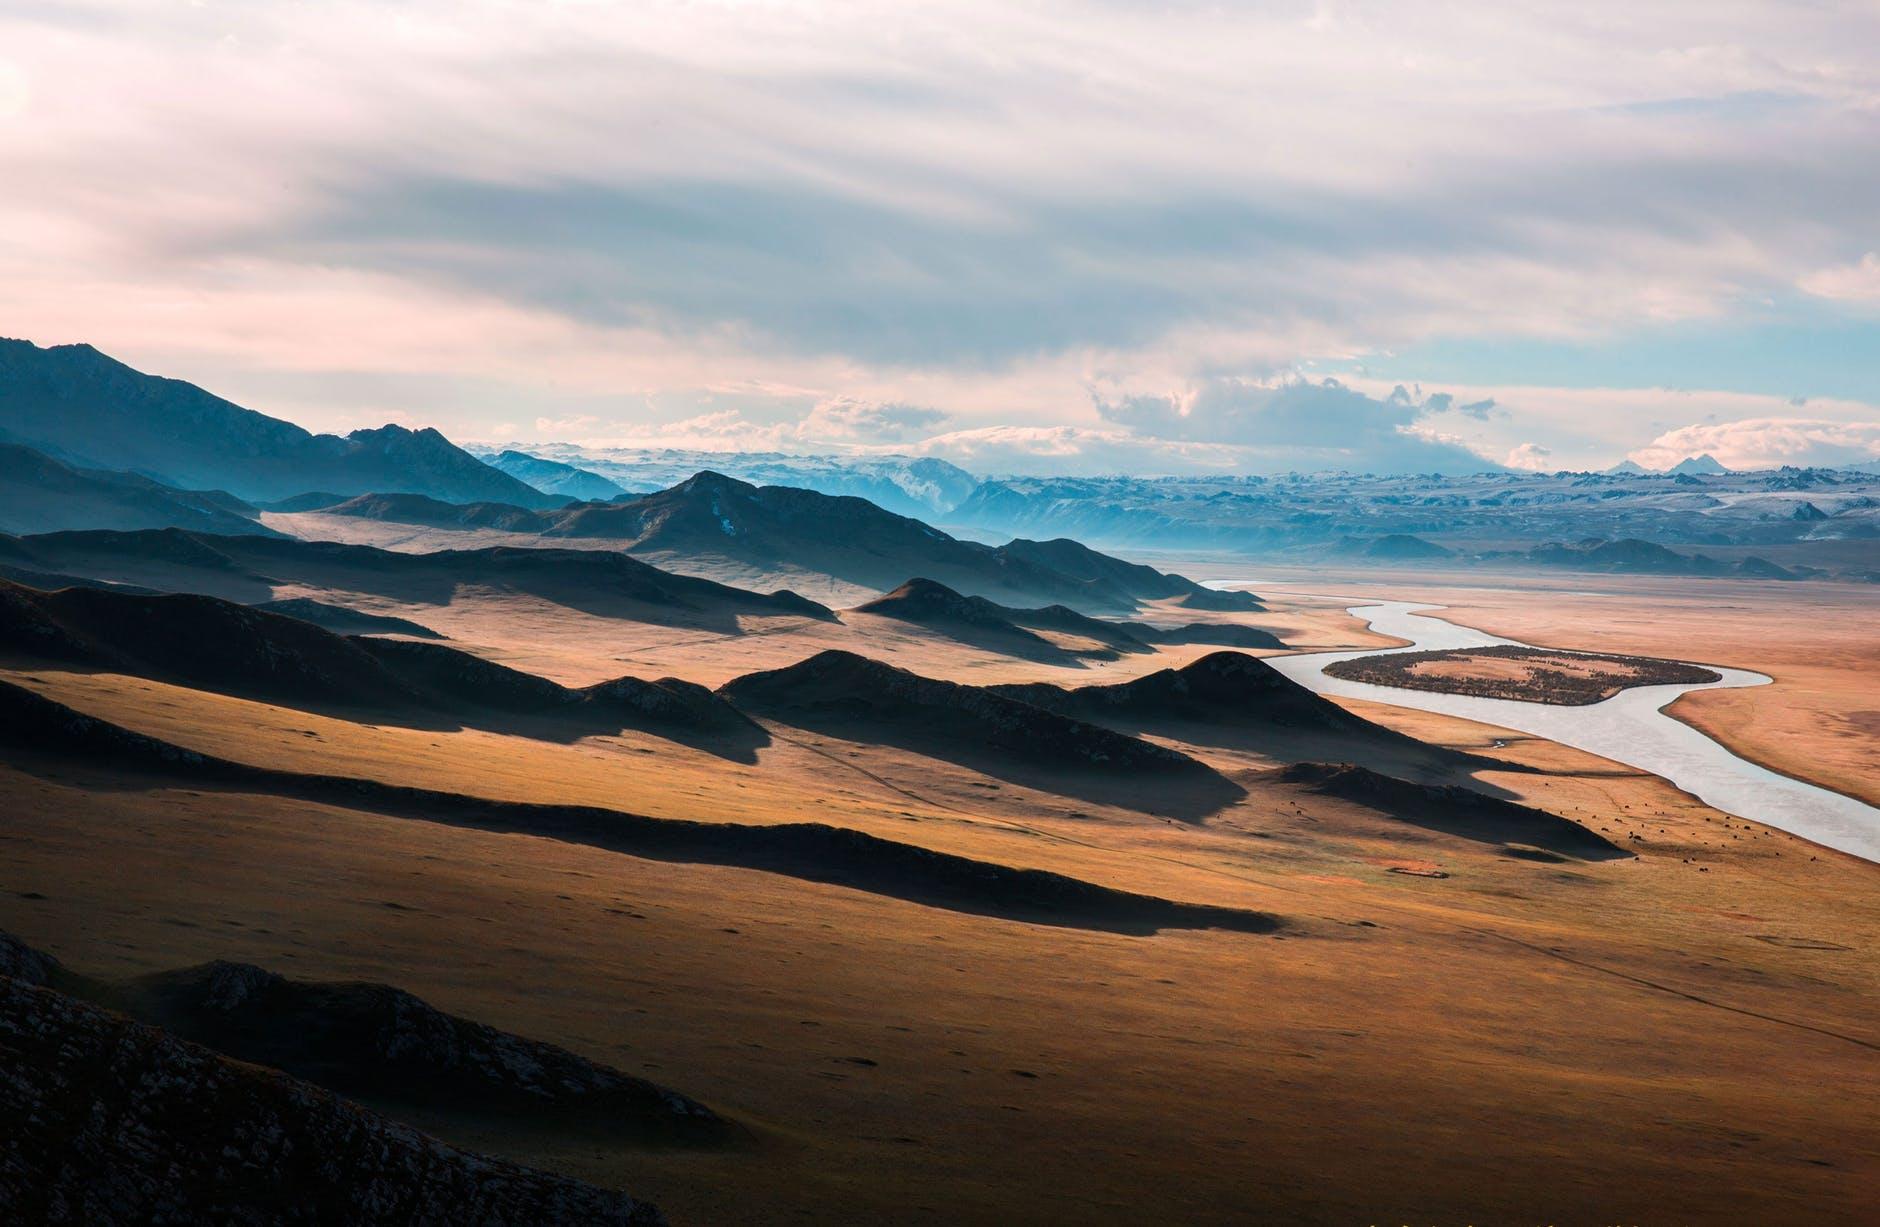 mountain highway prairie the scenery